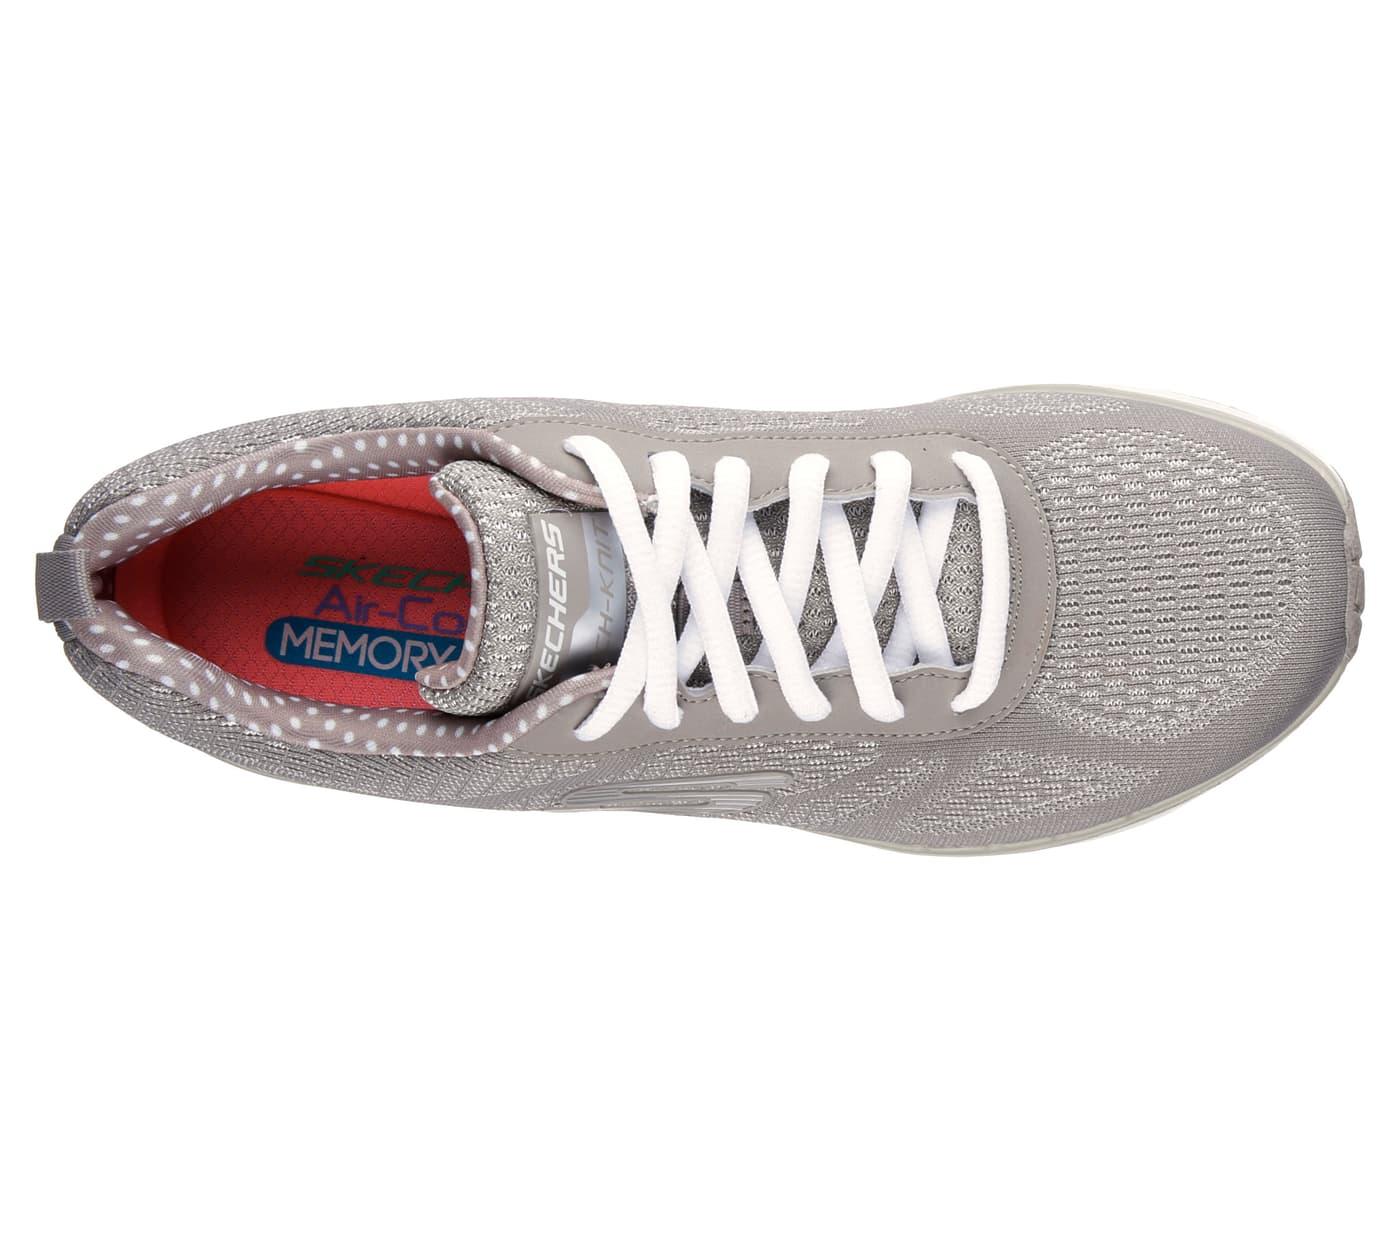 Skechers Skech Air Infinity Chaussures de loisirs pour femme